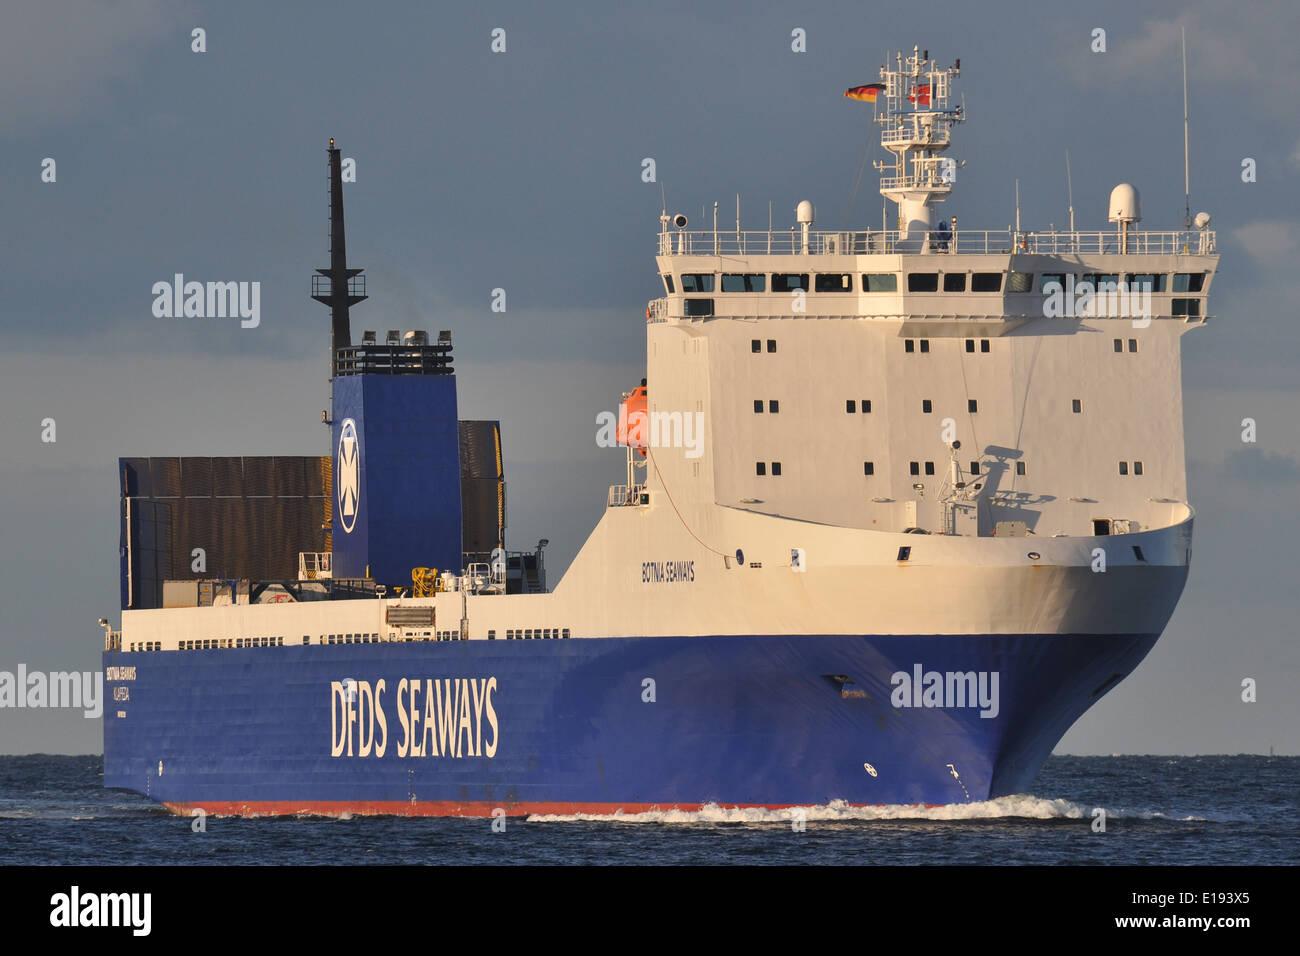 Freight ferry Botnia Seaways inbound Kiel Fjord from russia. - Stock Image